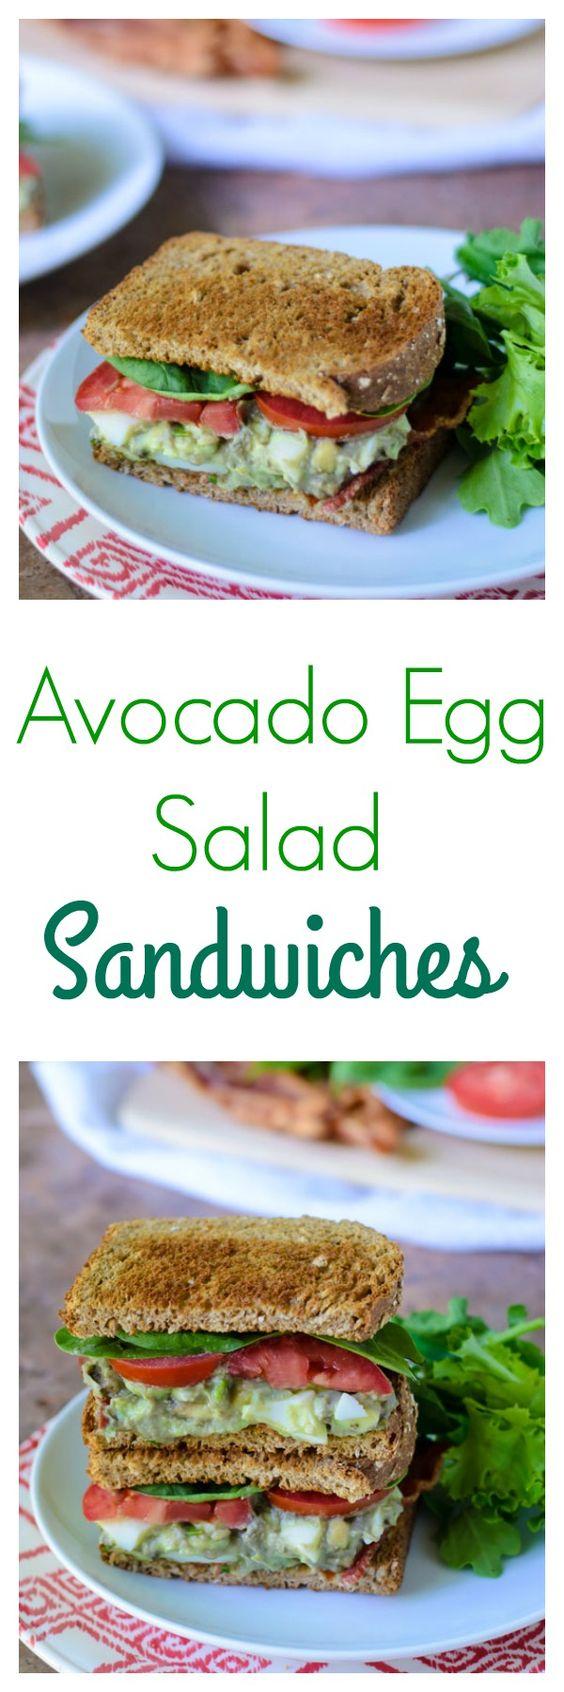 avocado eggs greek yogurt sandwiches lunches recipe egg salad avocado ...